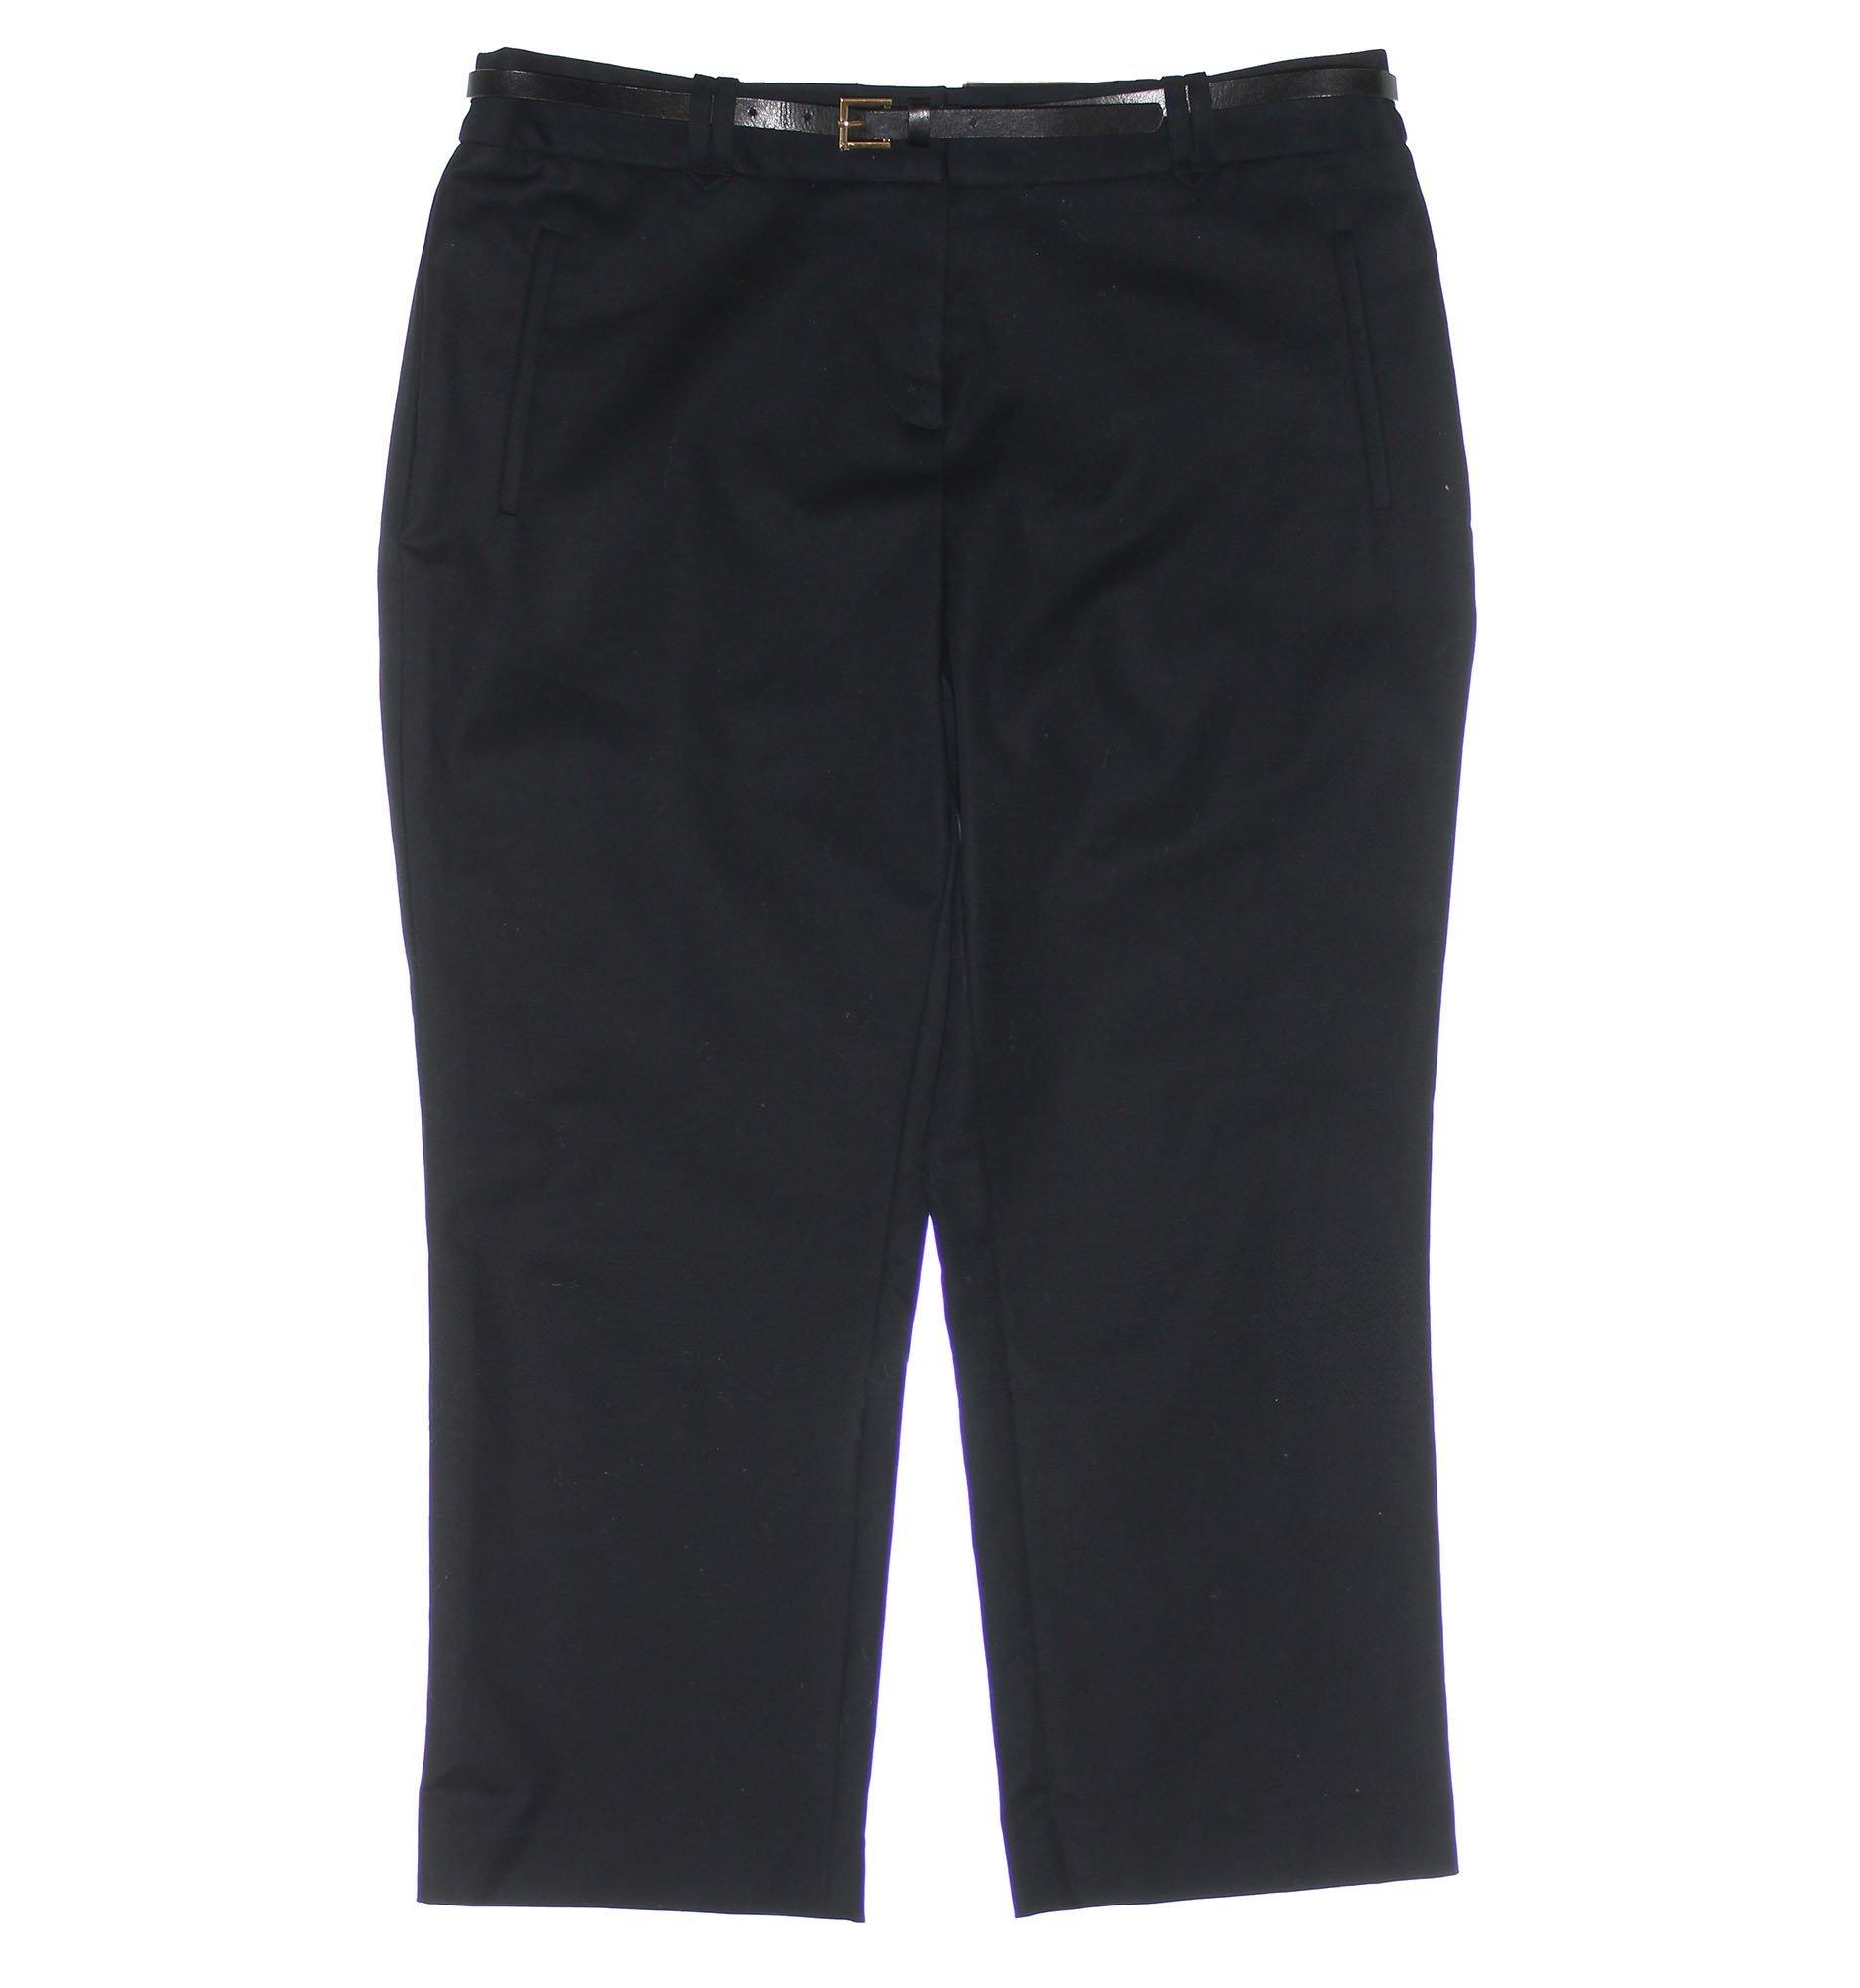 Charter Club Women's Tummy Slimming Slim Leg Belted Capri Pants 10 Black